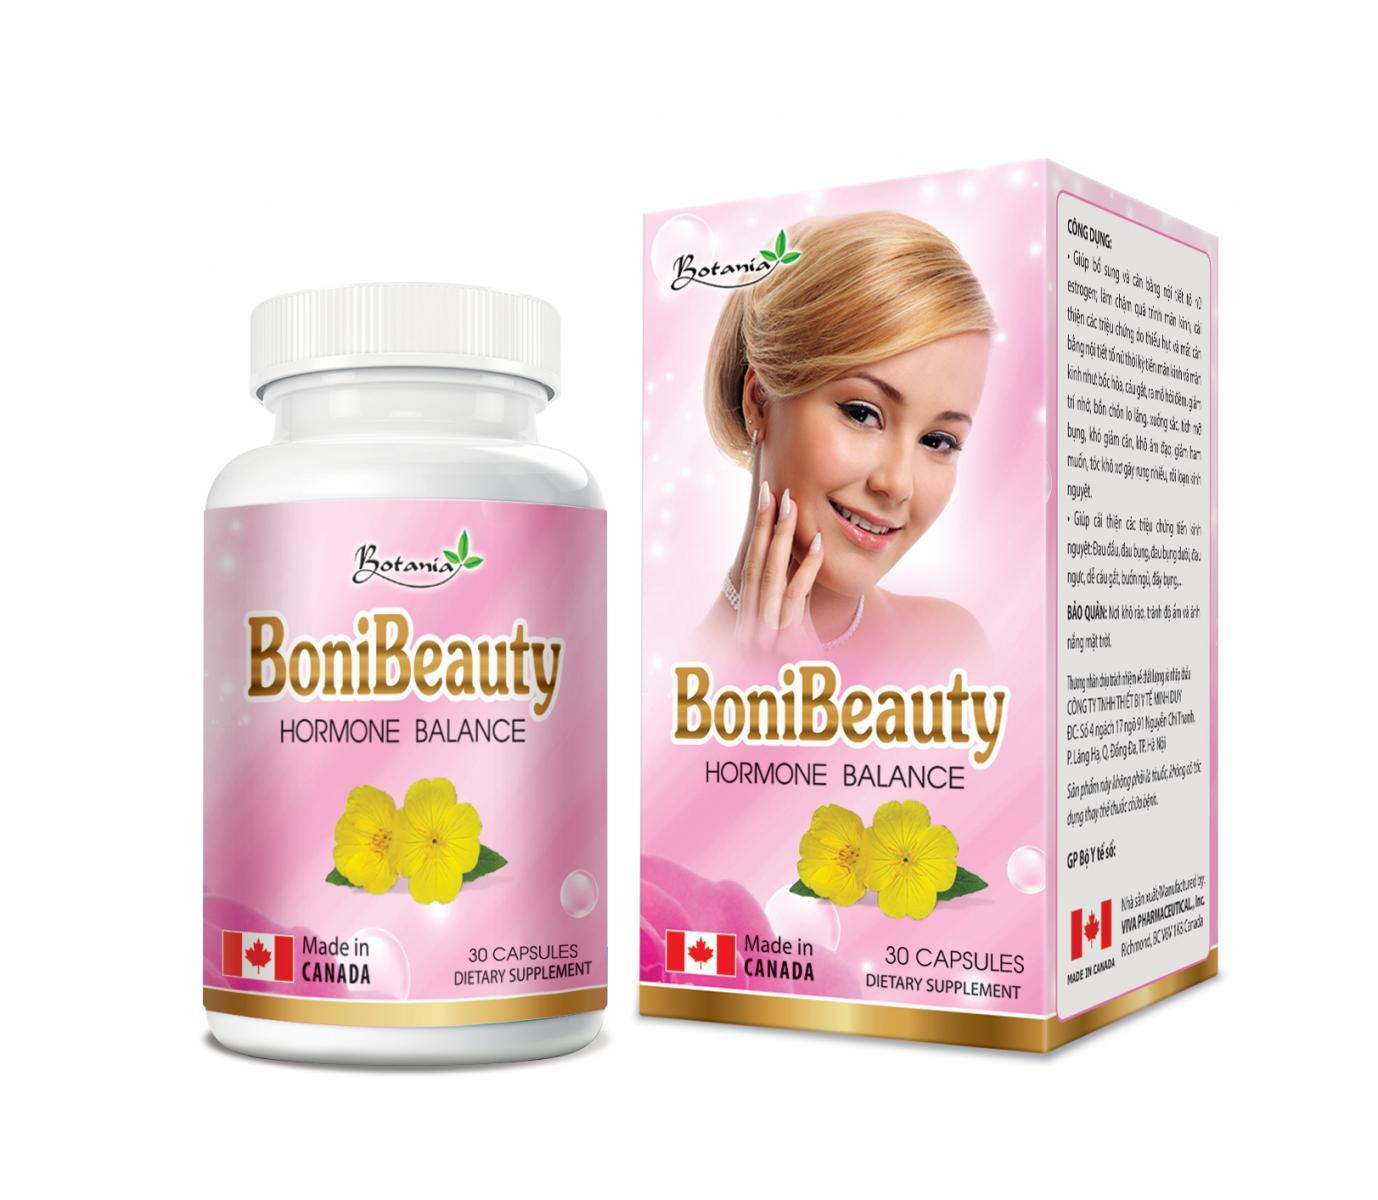 bonibeauty, bonibeauty có tốt không, bonibeauty gia bao nhieu, vien uong bonibeauty, có nên dùng bonibeauty, boni beauty, viên uống bonibeauty có tốt không